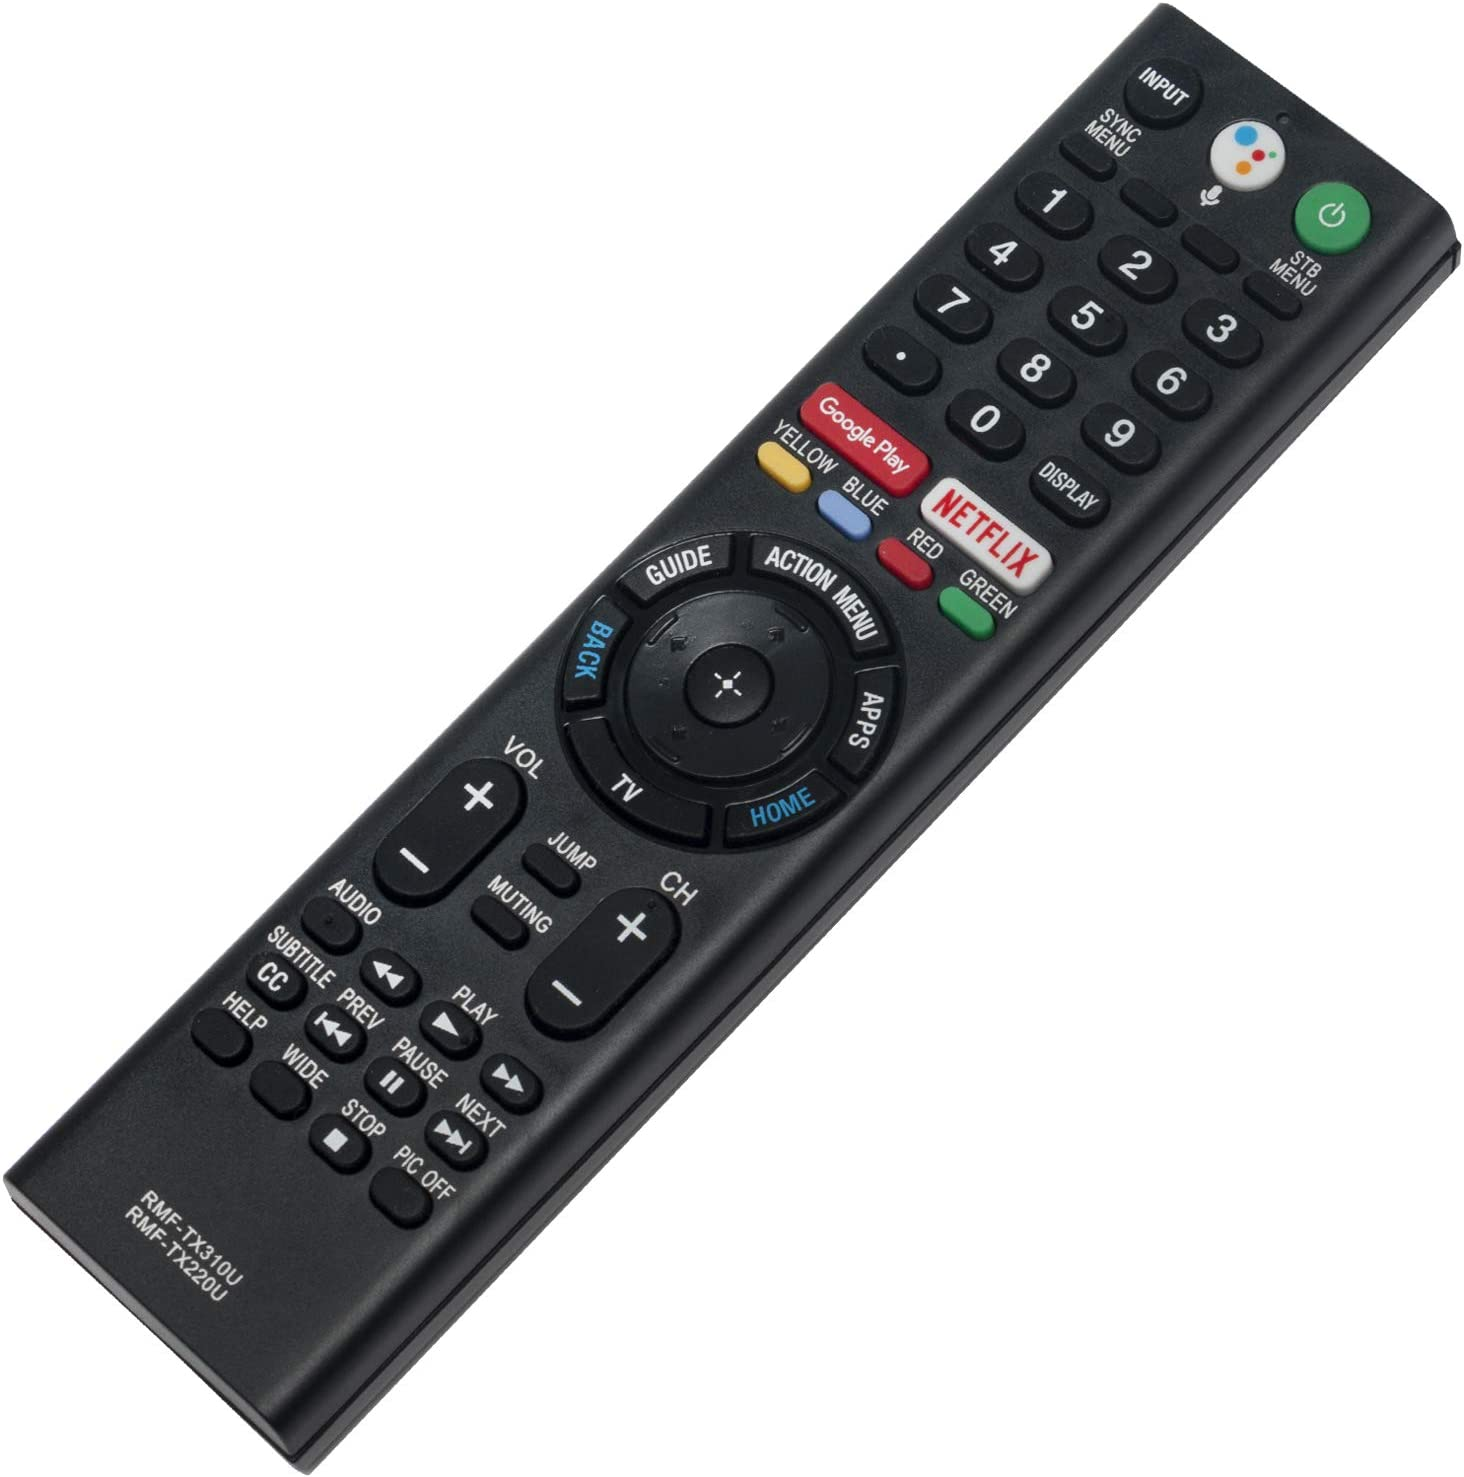 RMF-TX310U RMF-TX220U Replace Voice Remote Control fit for Sony 4K Smart Bravia TV XBR-43X800G XBR-75X800G XBR-65X800G XBR-49X800G XBR-55X800G XBR-55X900F KD-55X751F KD-55X755F KD-55X757F KD-75X780F